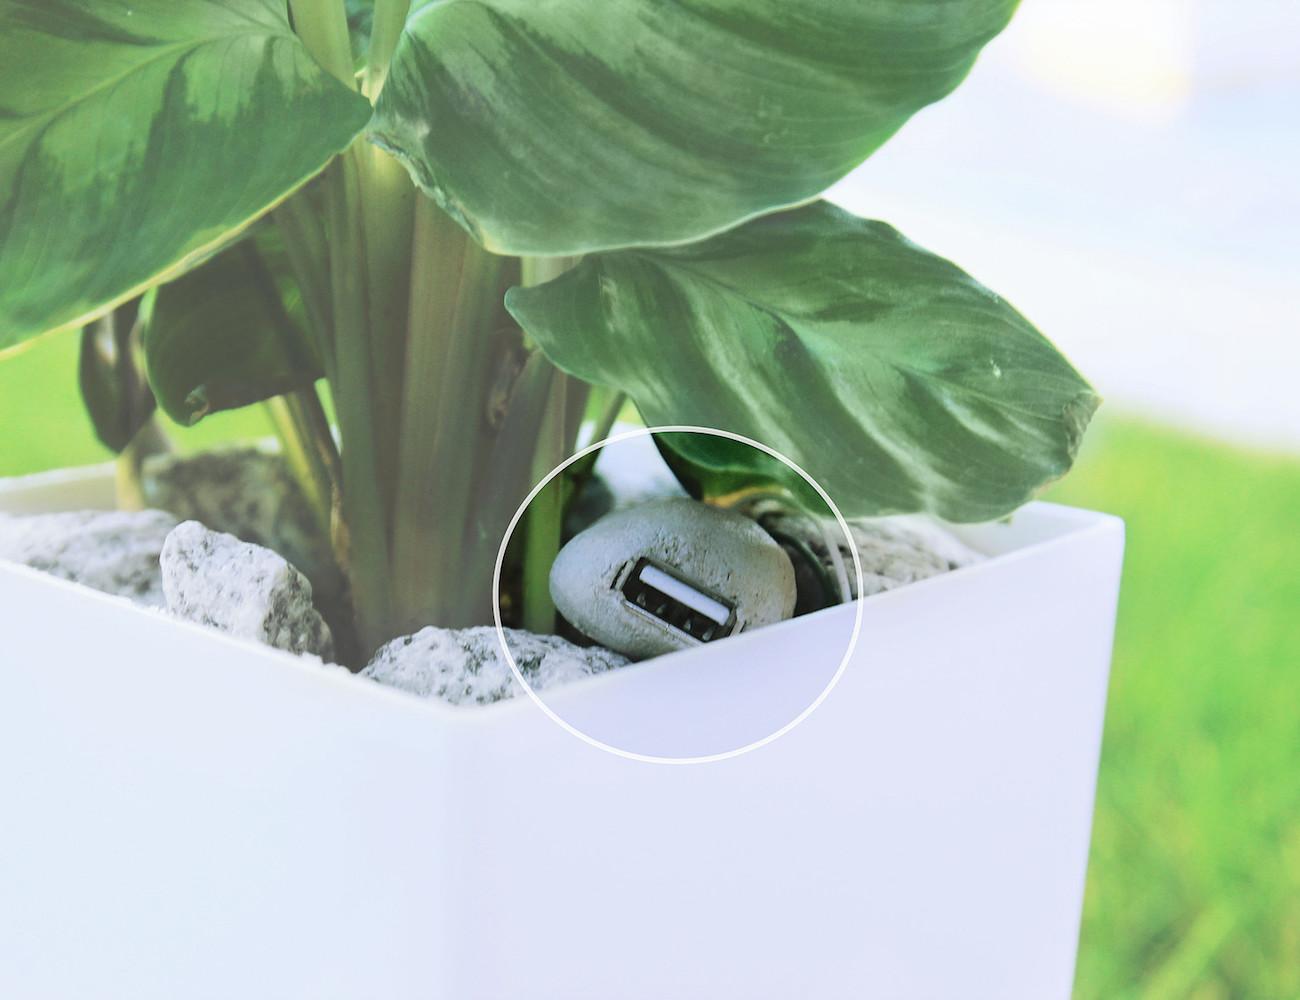 bioo-lite-plant-pot-charger-01